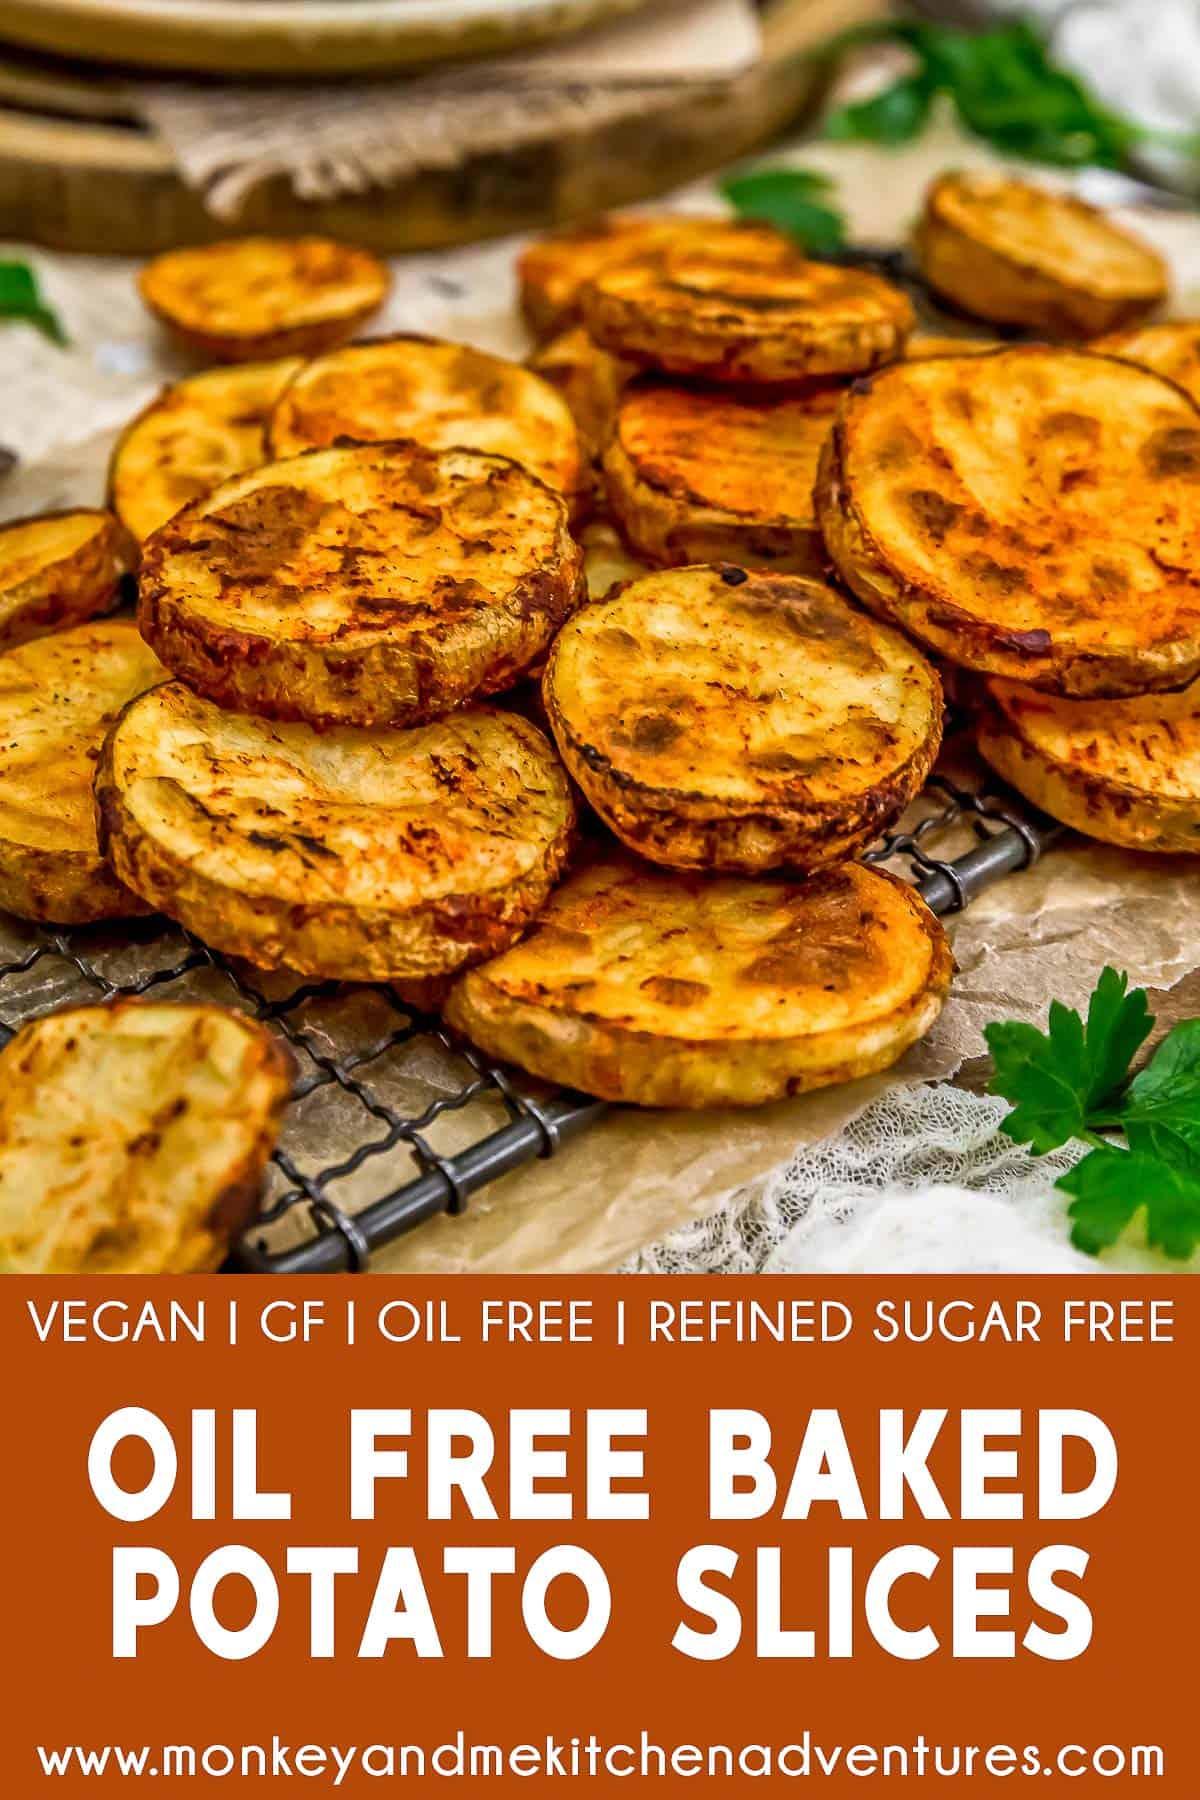 Oil-Free Baked Potato Slices with text description